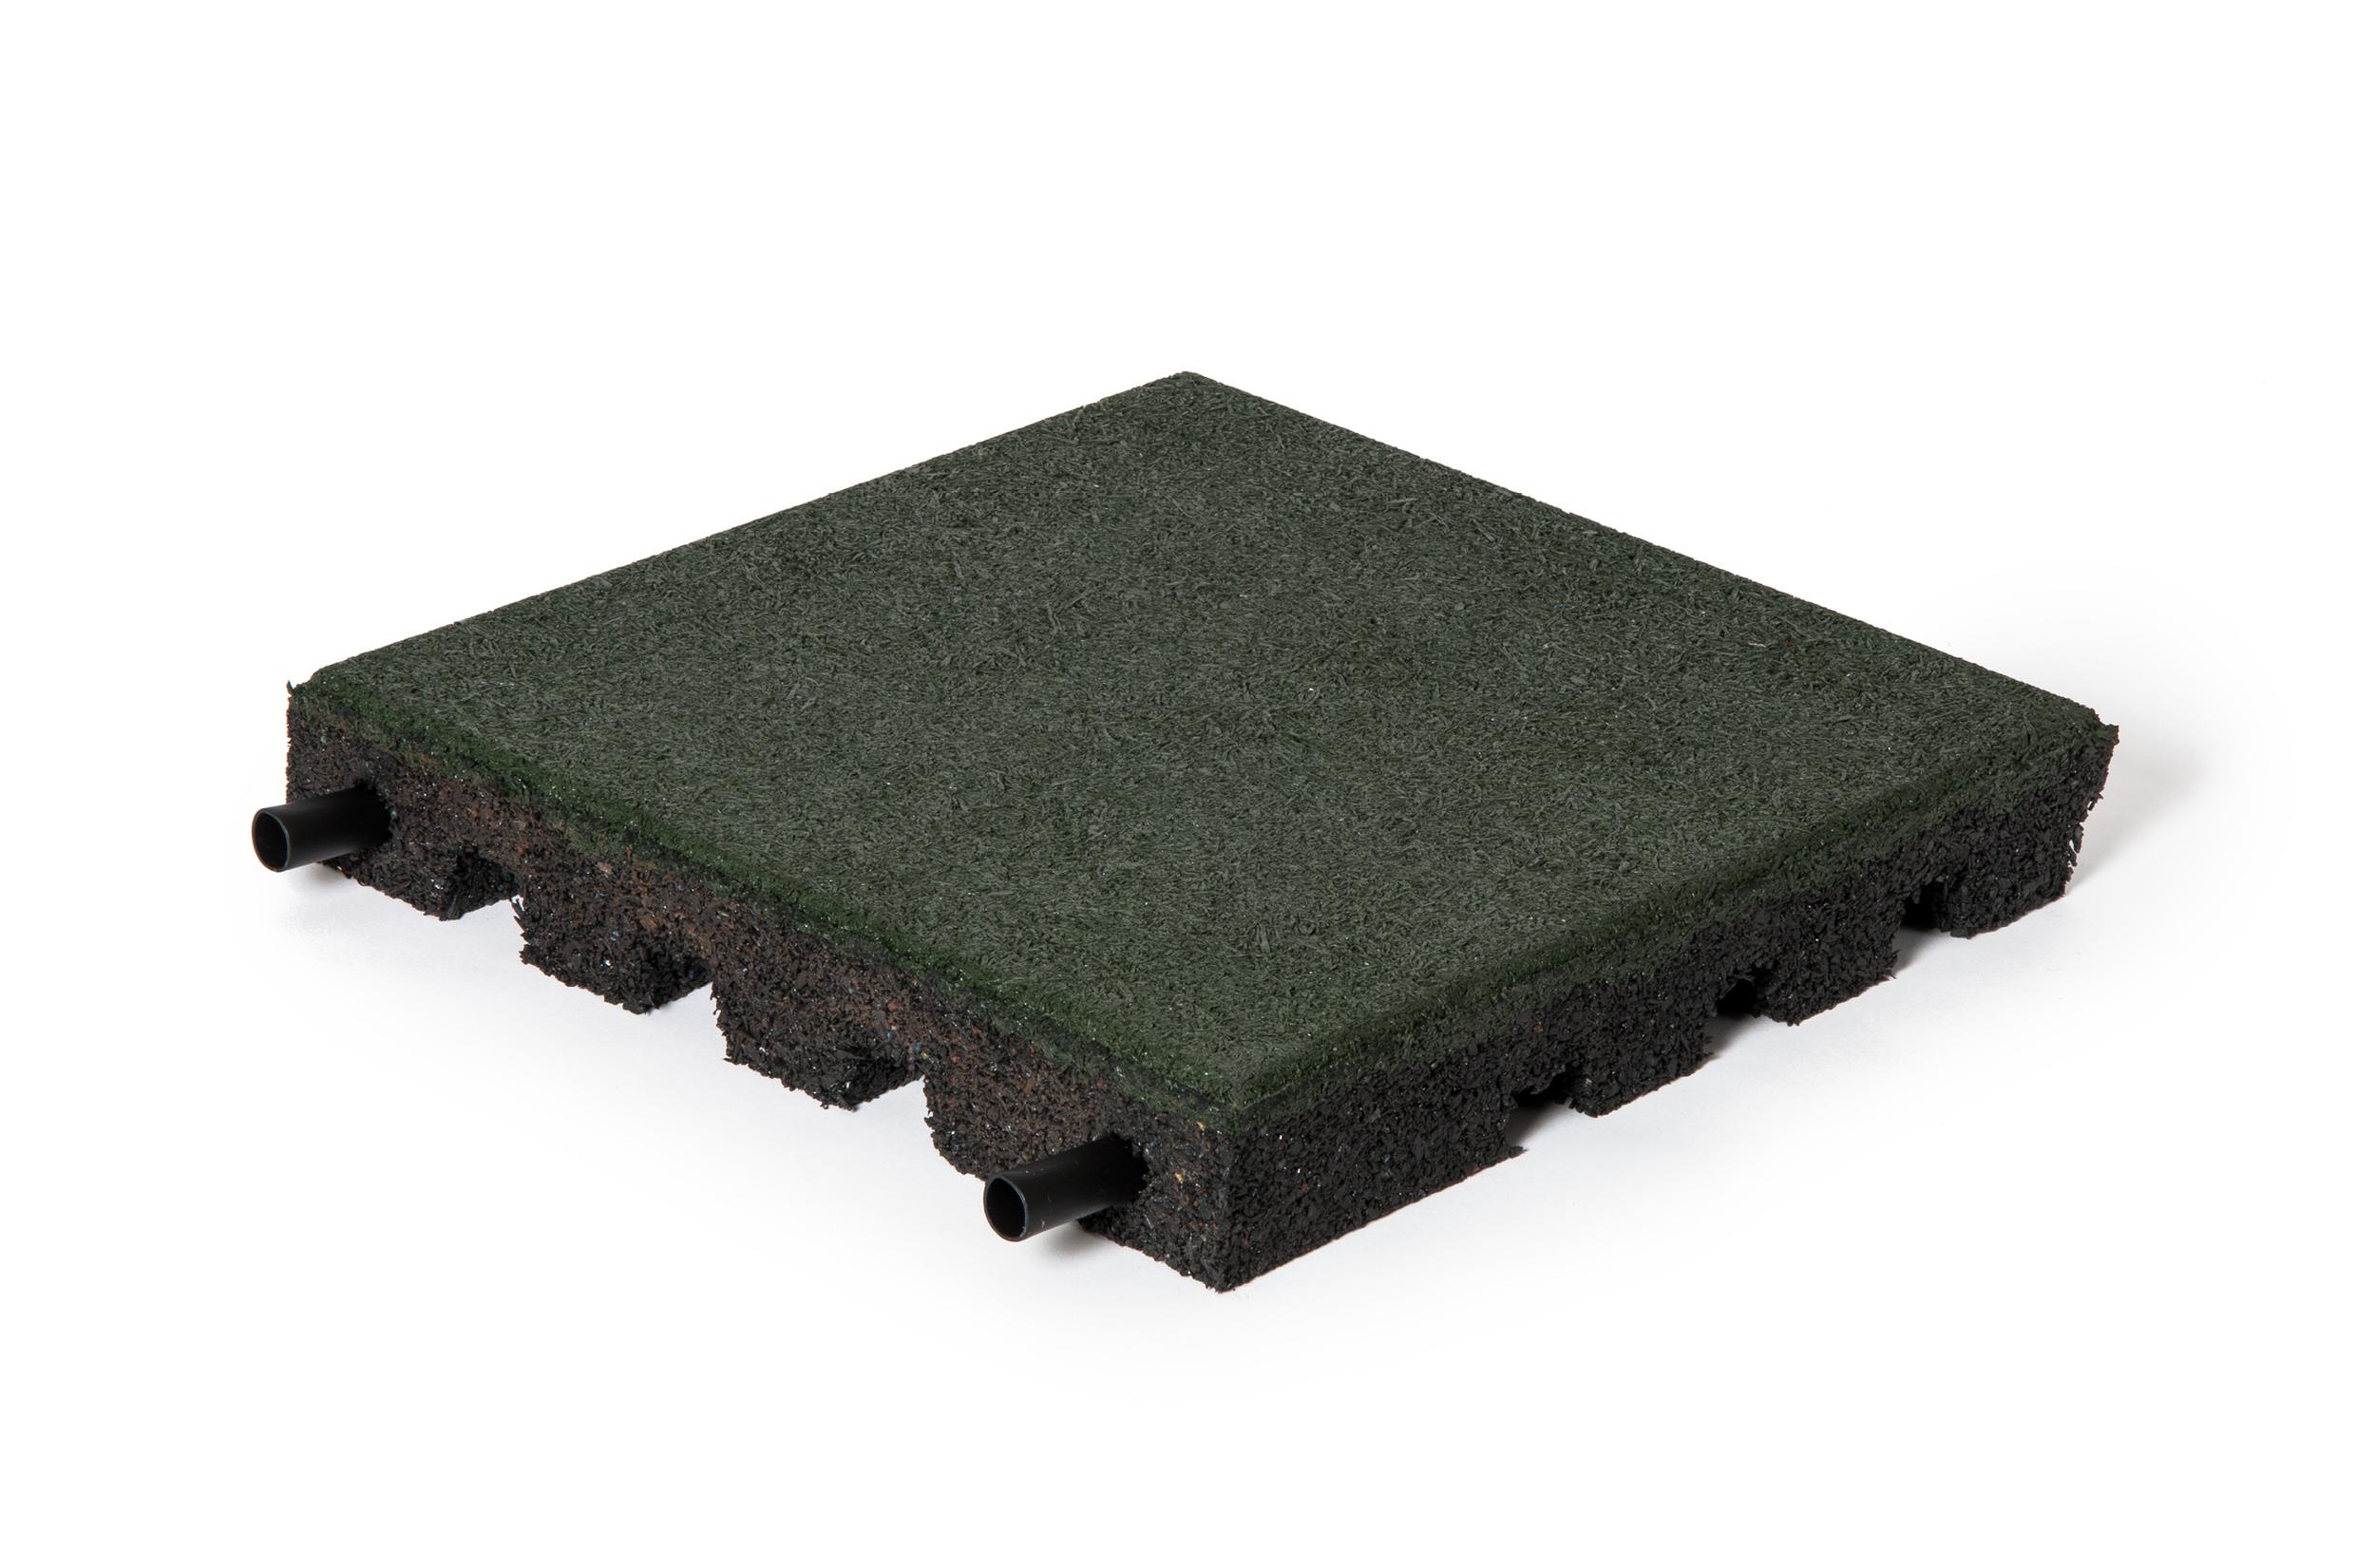 Rymar-Rubber-PlayFall-Tiles-Green-2.jpg